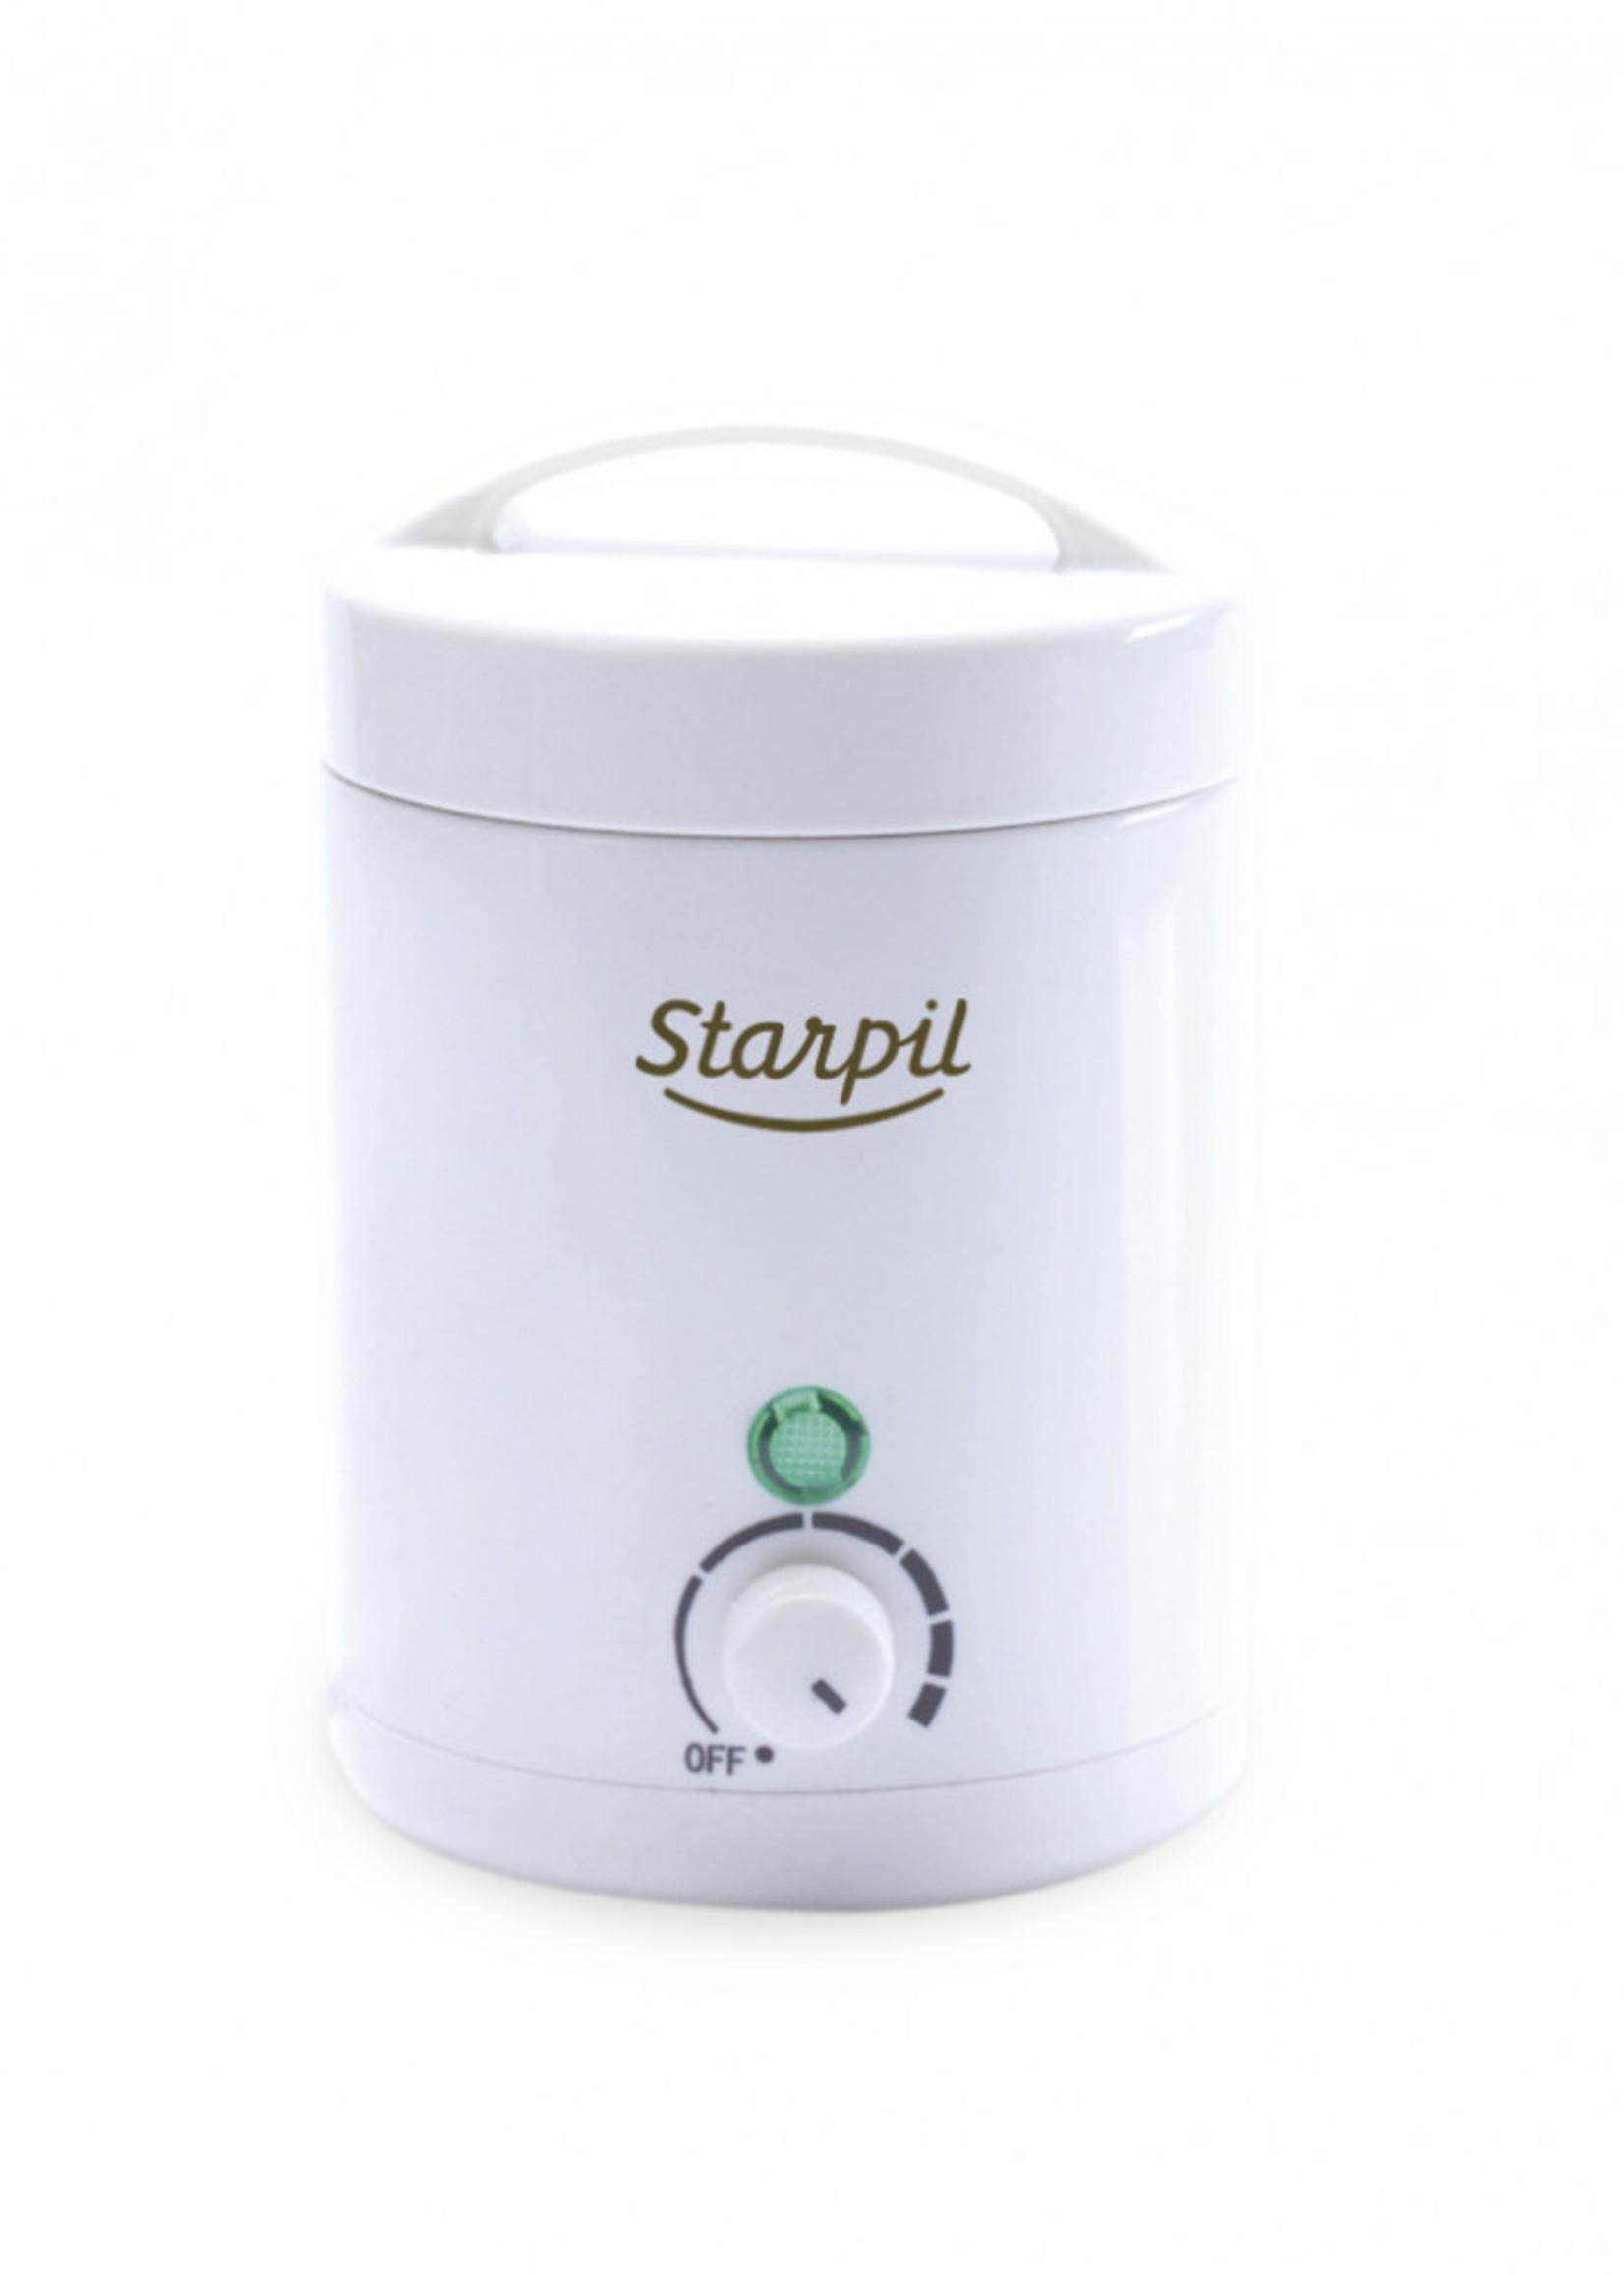 Starpil Professional Facial wax heater melter 6.76 fl oz